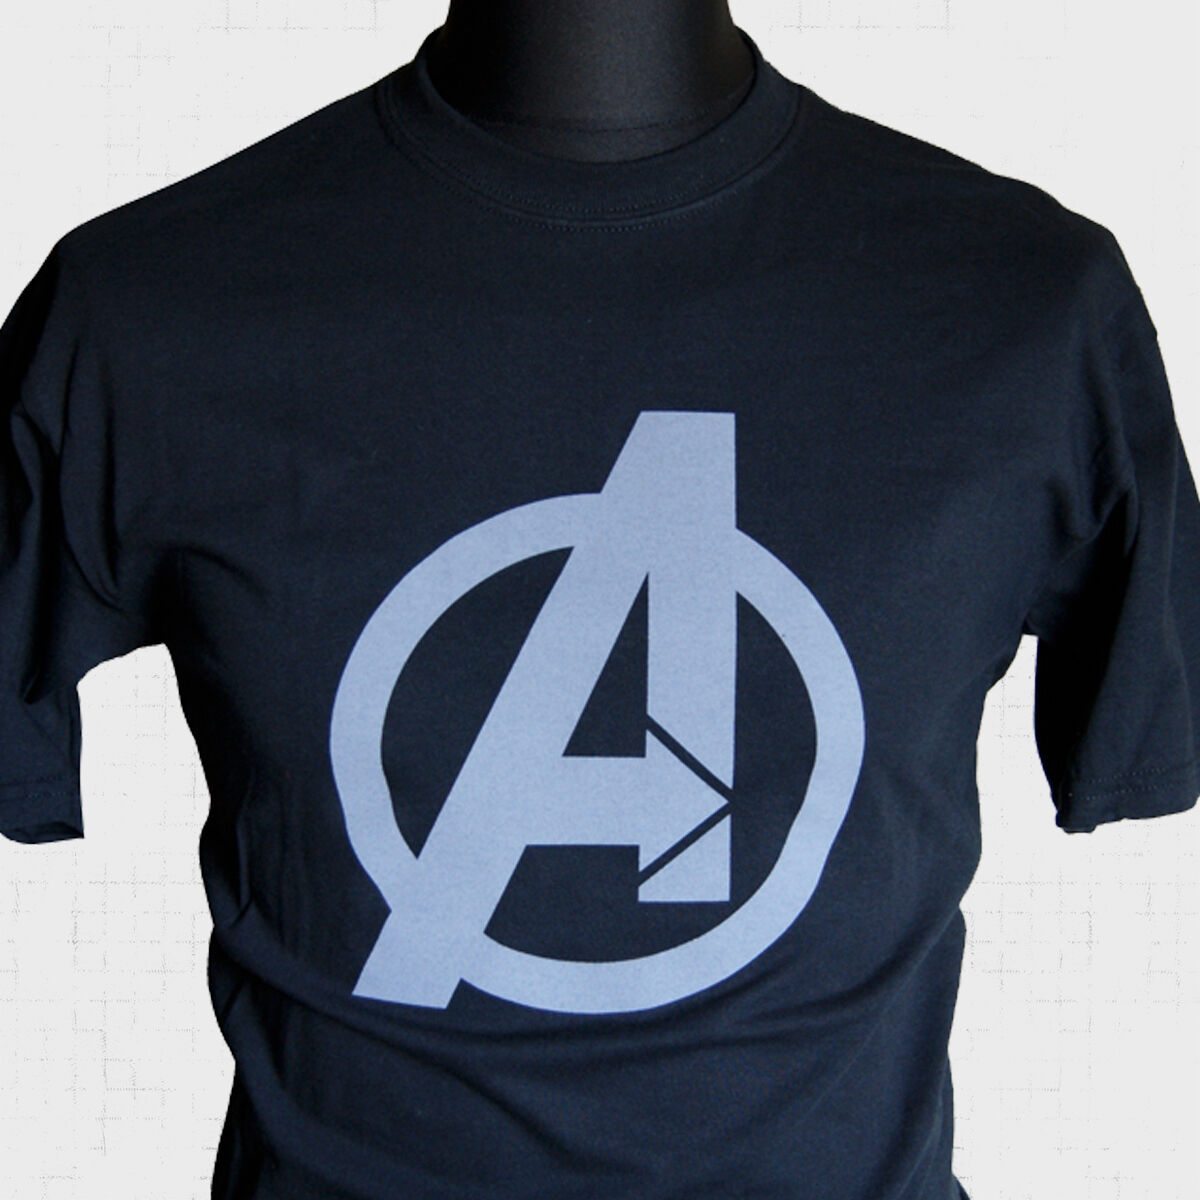 the avengers logo t shirt super hero hulk iron man captain. Black Bedroom Furniture Sets. Home Design Ideas